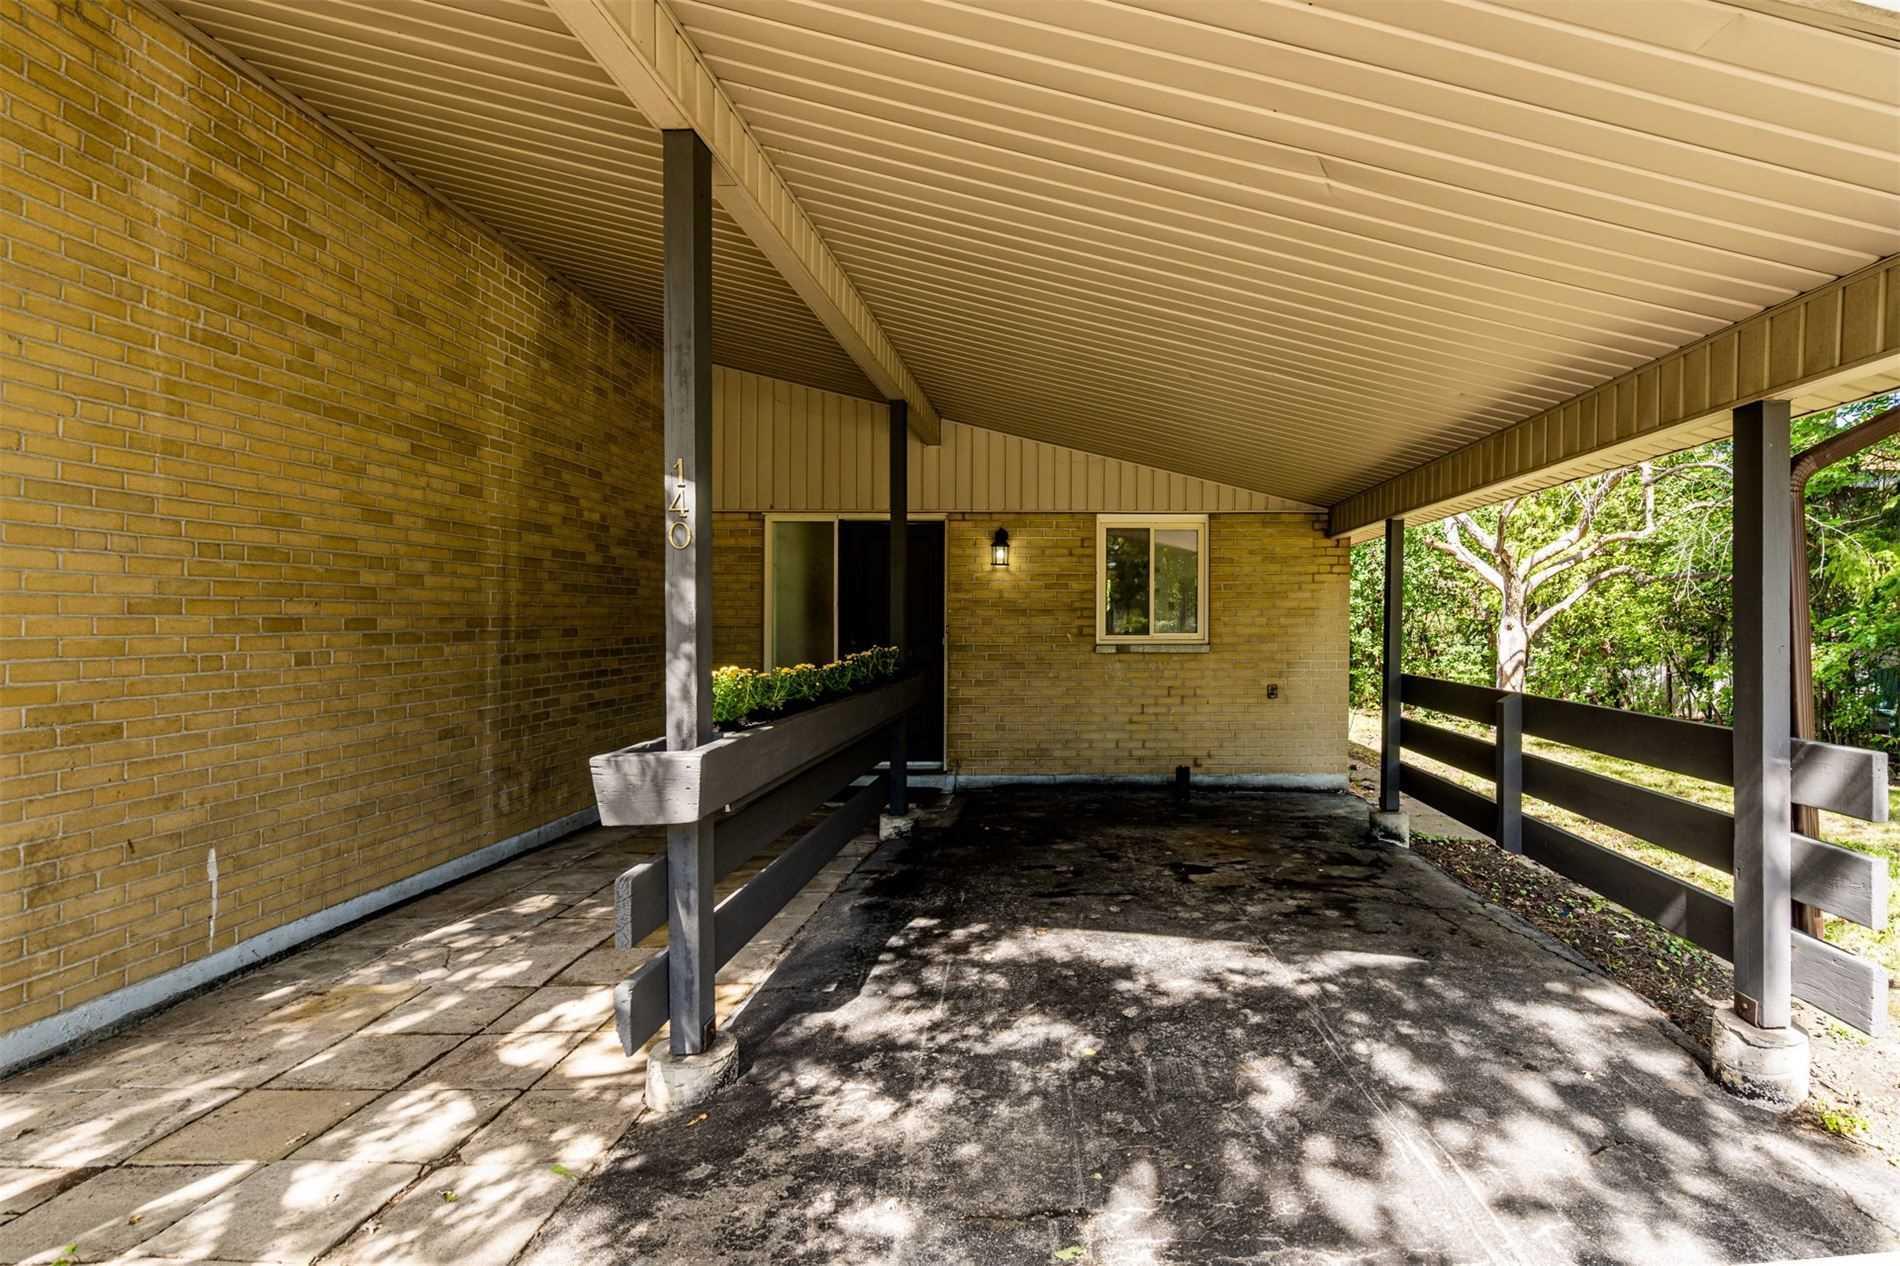 140 Verobeach Blvd - Humbermede Detached for sale, 3 Bedrooms (W5385046) - #29